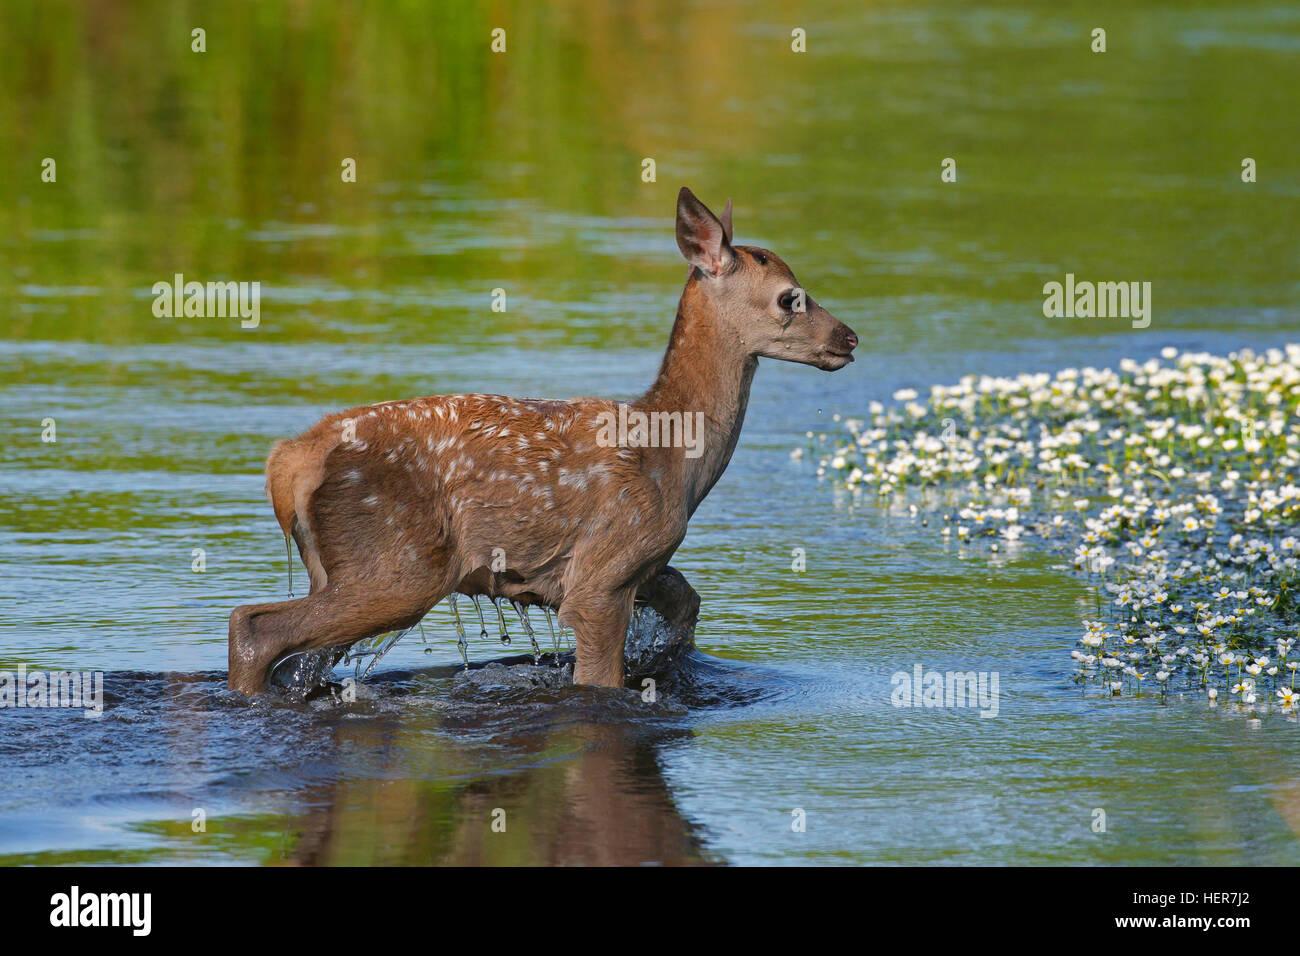 Red deer (Cervus elaphus) calf crossing river in summer - Stock Image